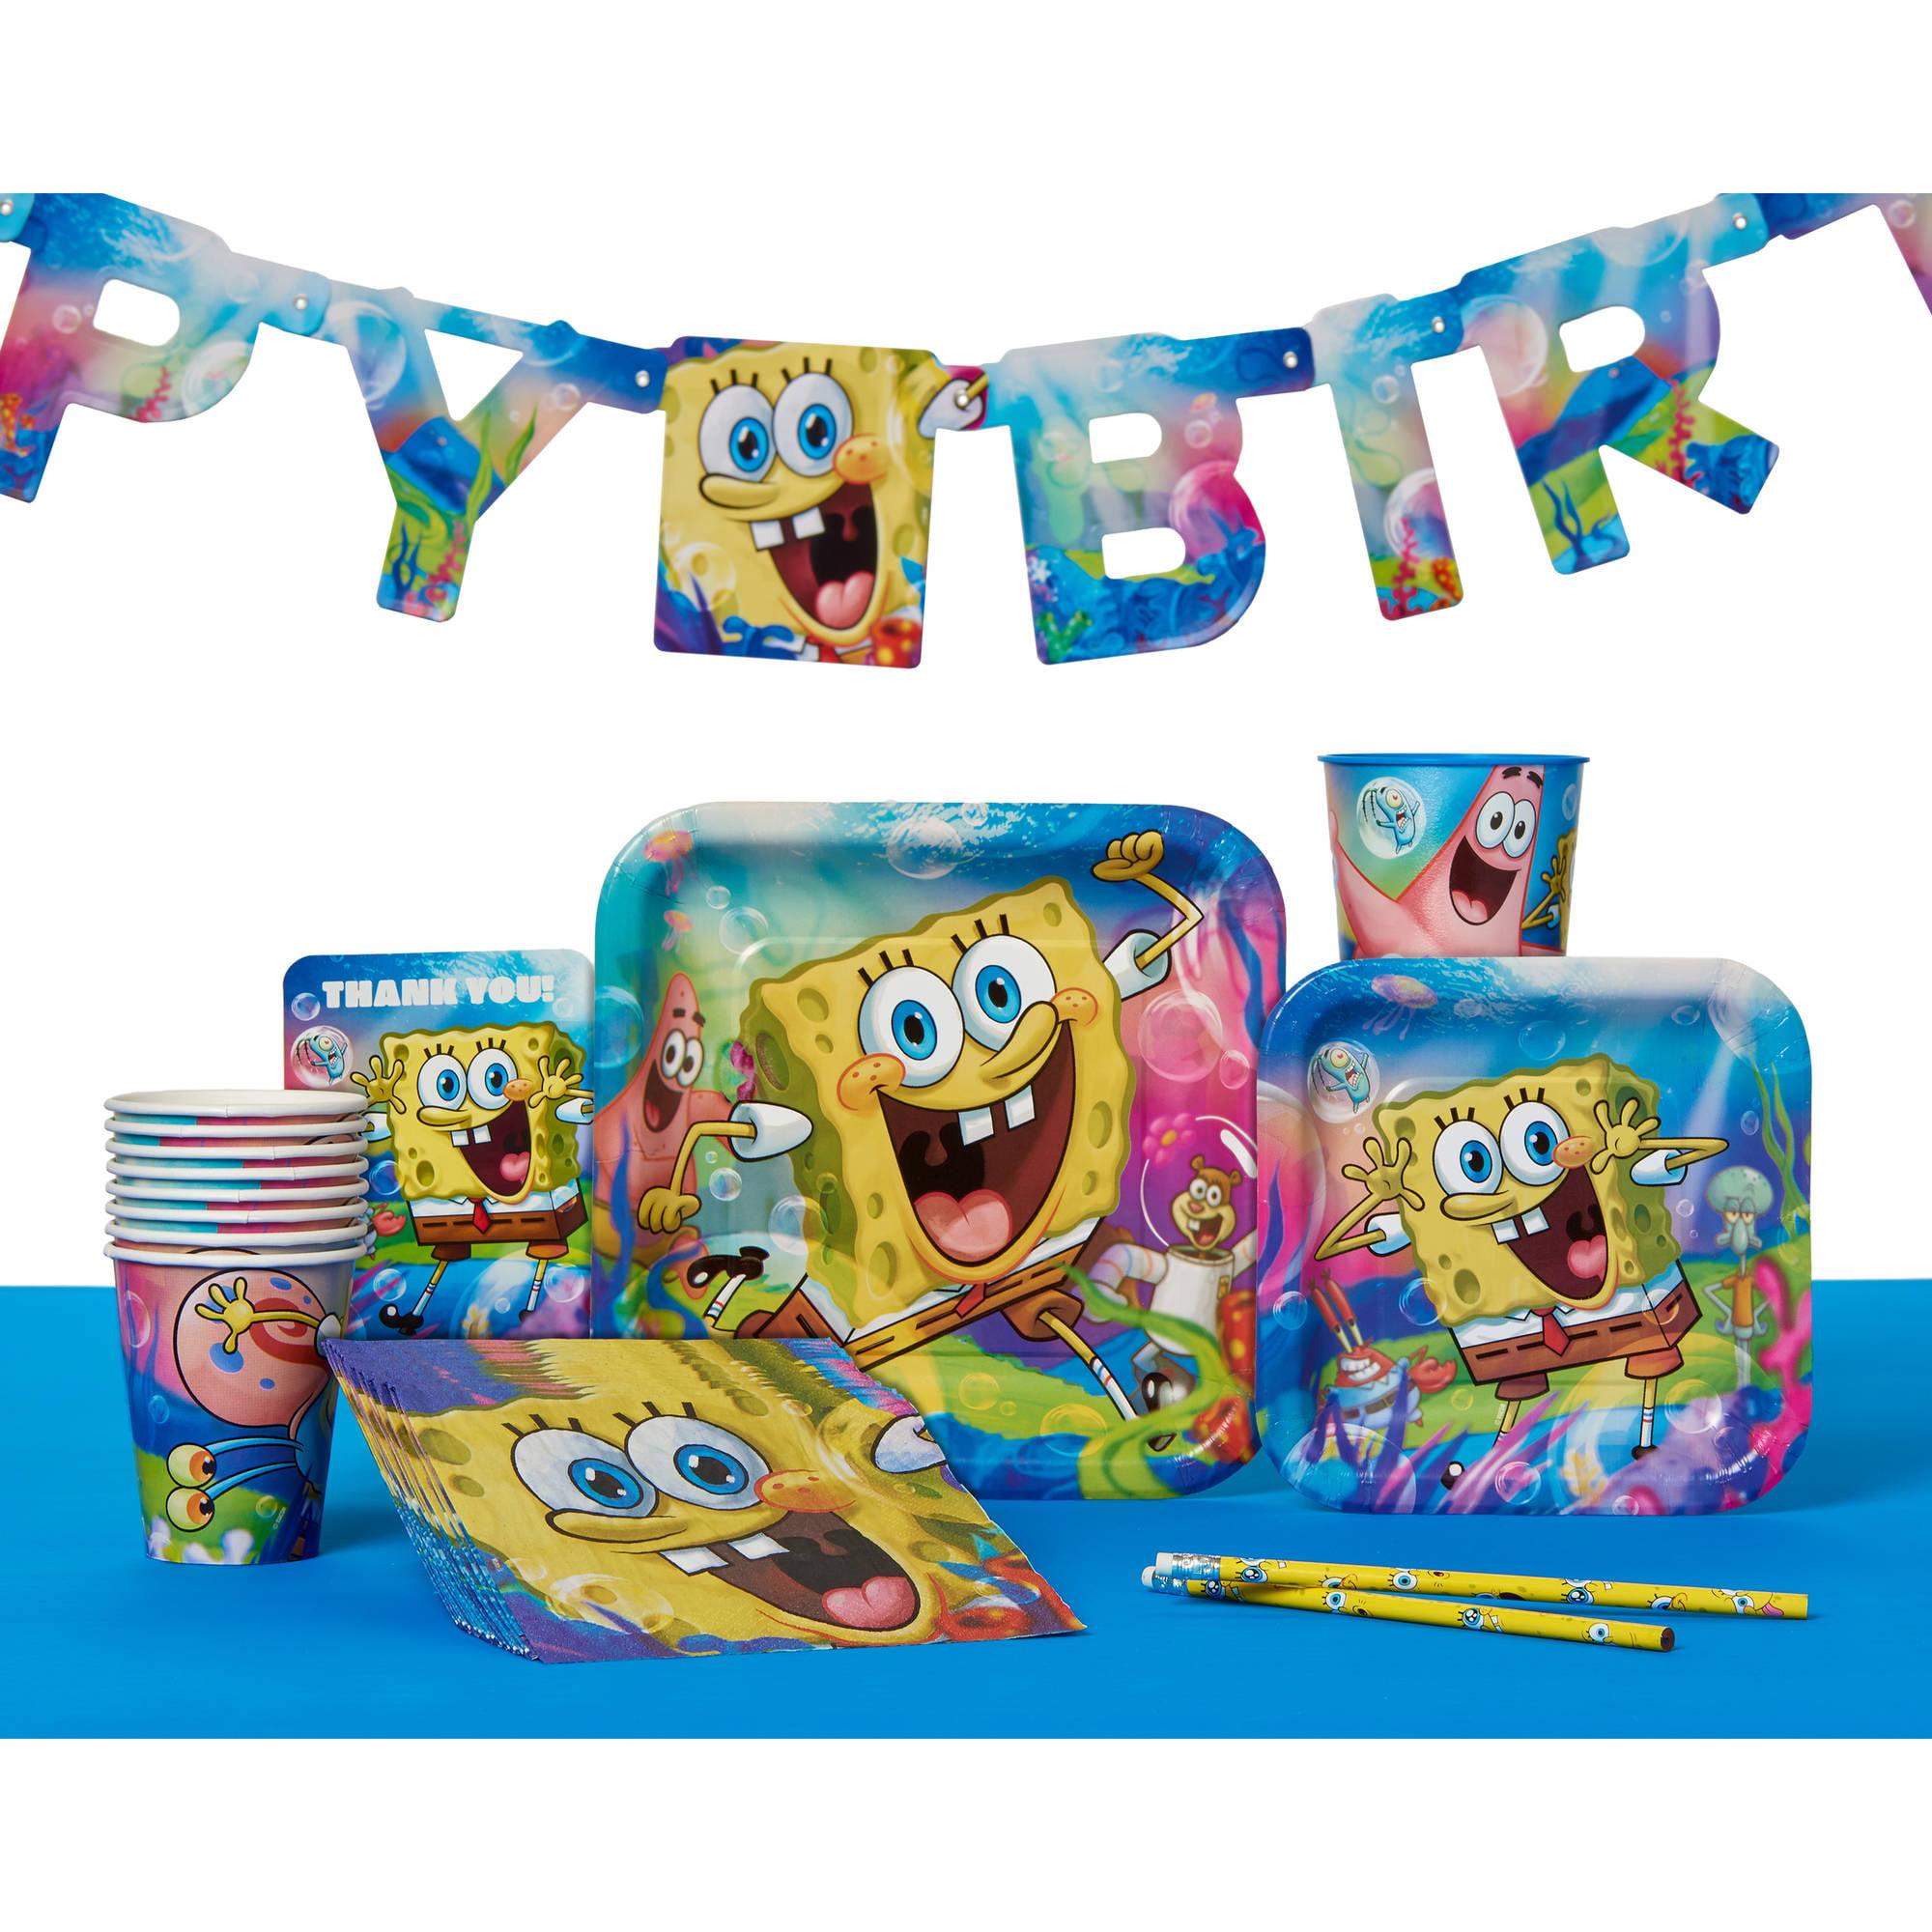 ~ Birthday Party Supplies Patrick Wrap SPONGEBOB SQUAREPANTS MINI GIFT BAGS 2